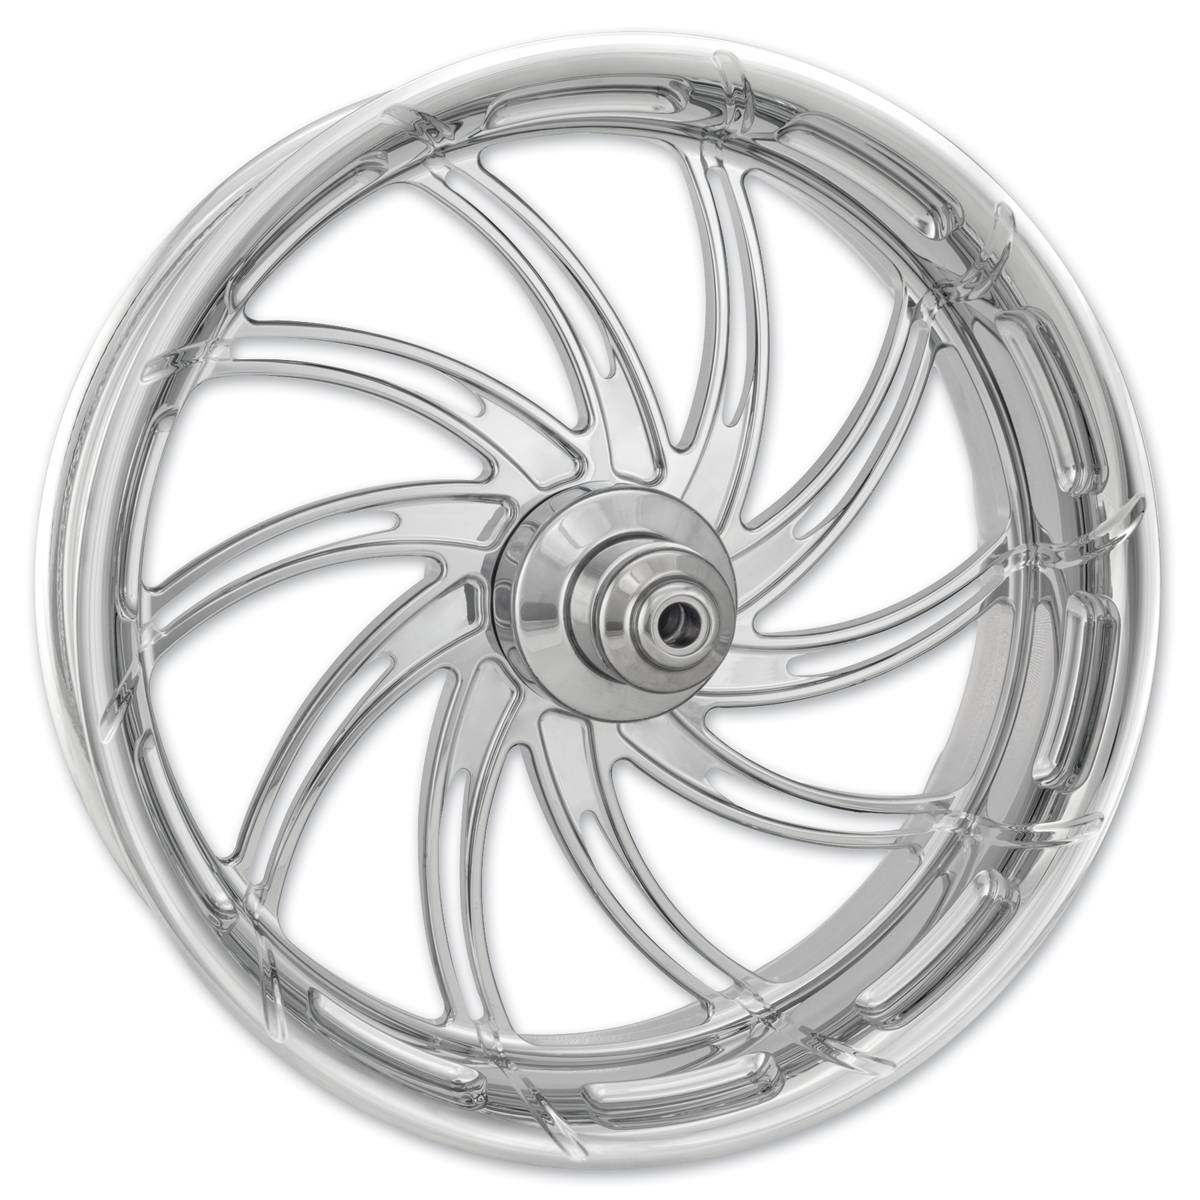 Performance Machine Supra Chrome Rear Wheel 17x6 Non-ABS